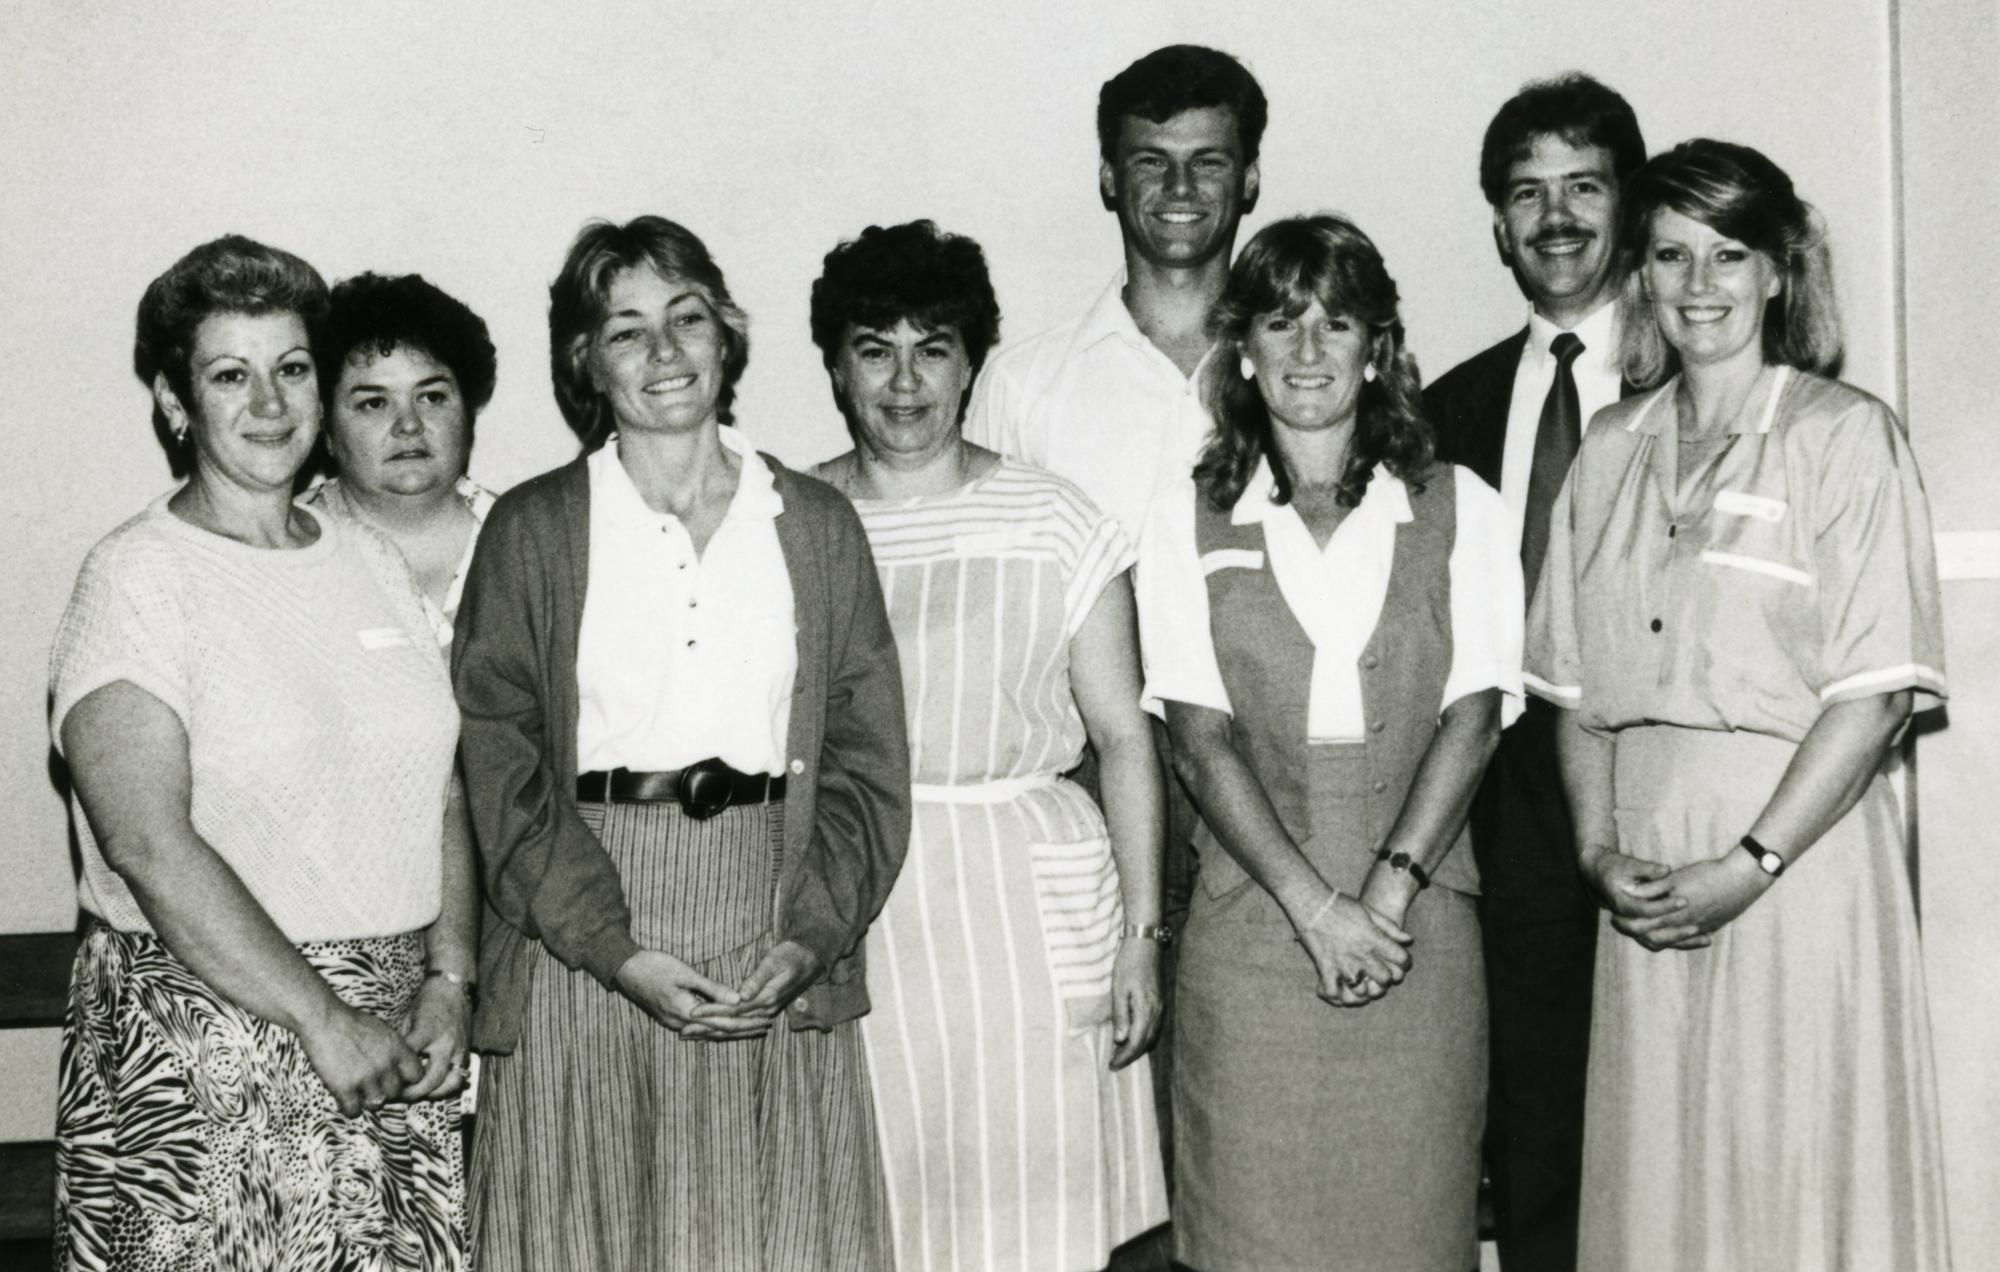 Auslan interpreters, 1980s